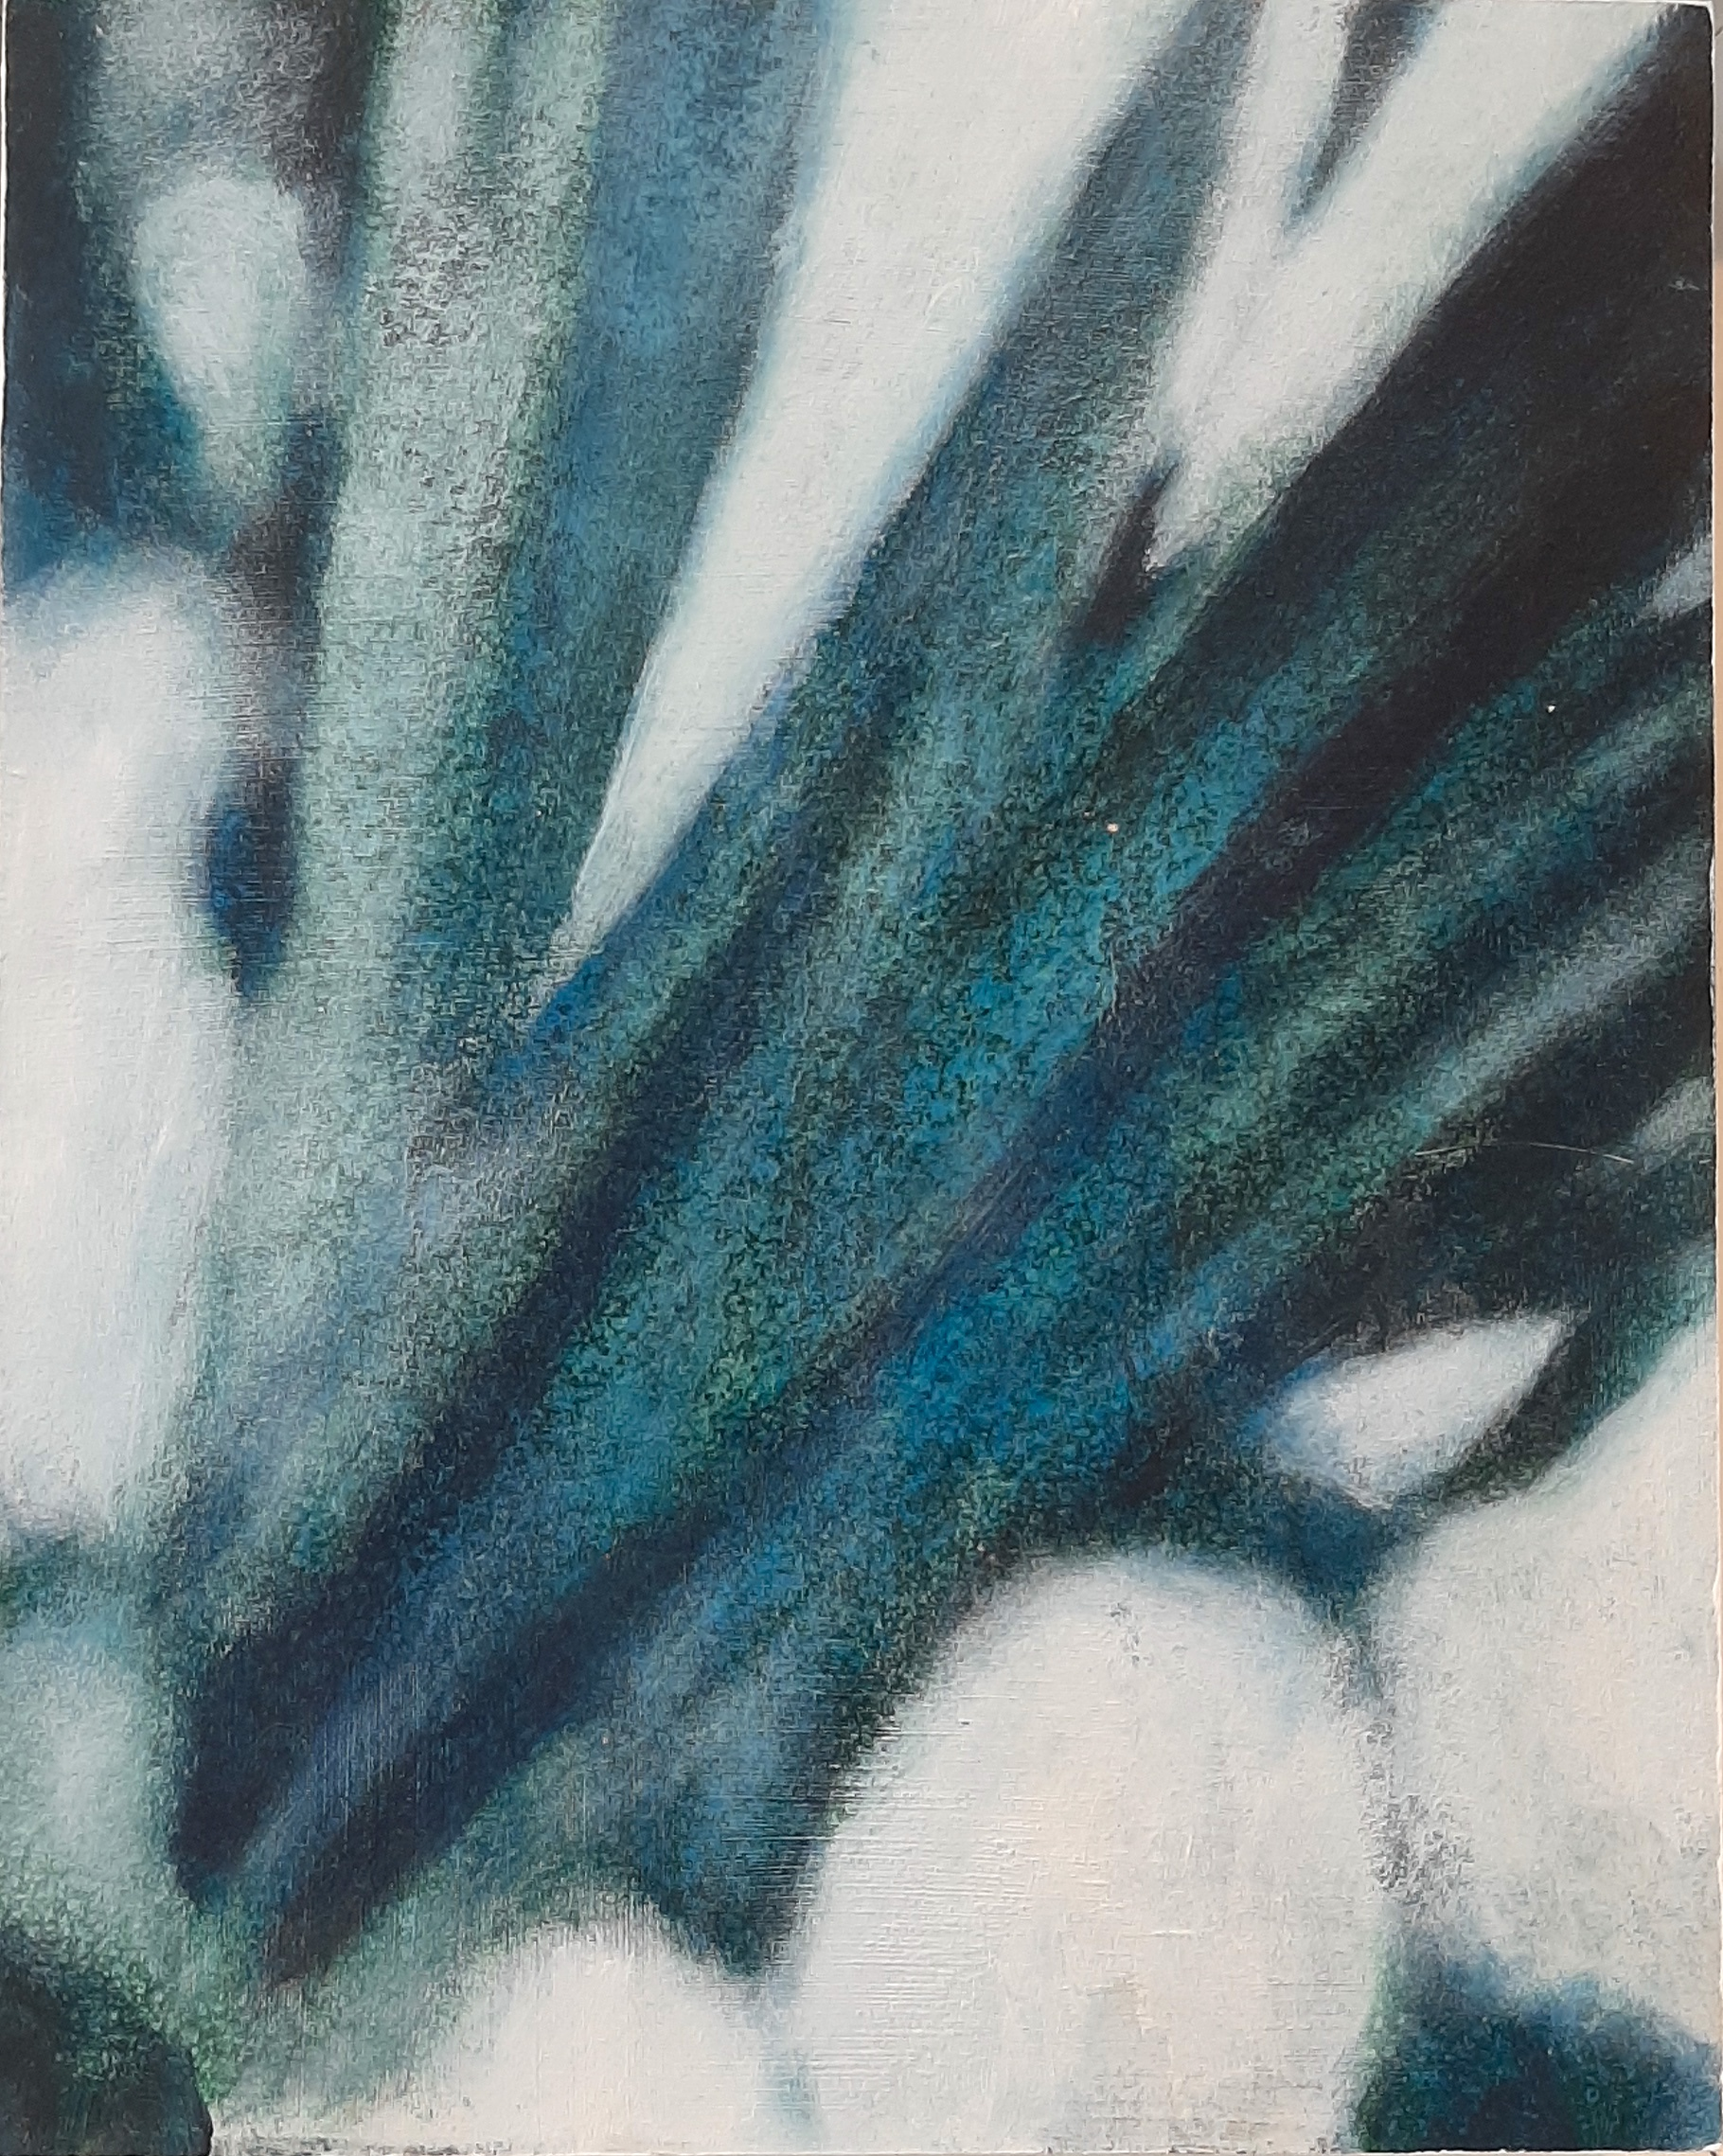 SENSI ARTE, Leaves Effect, acrilico su  cartonlegno, cm 25 x 20, BRLM_203